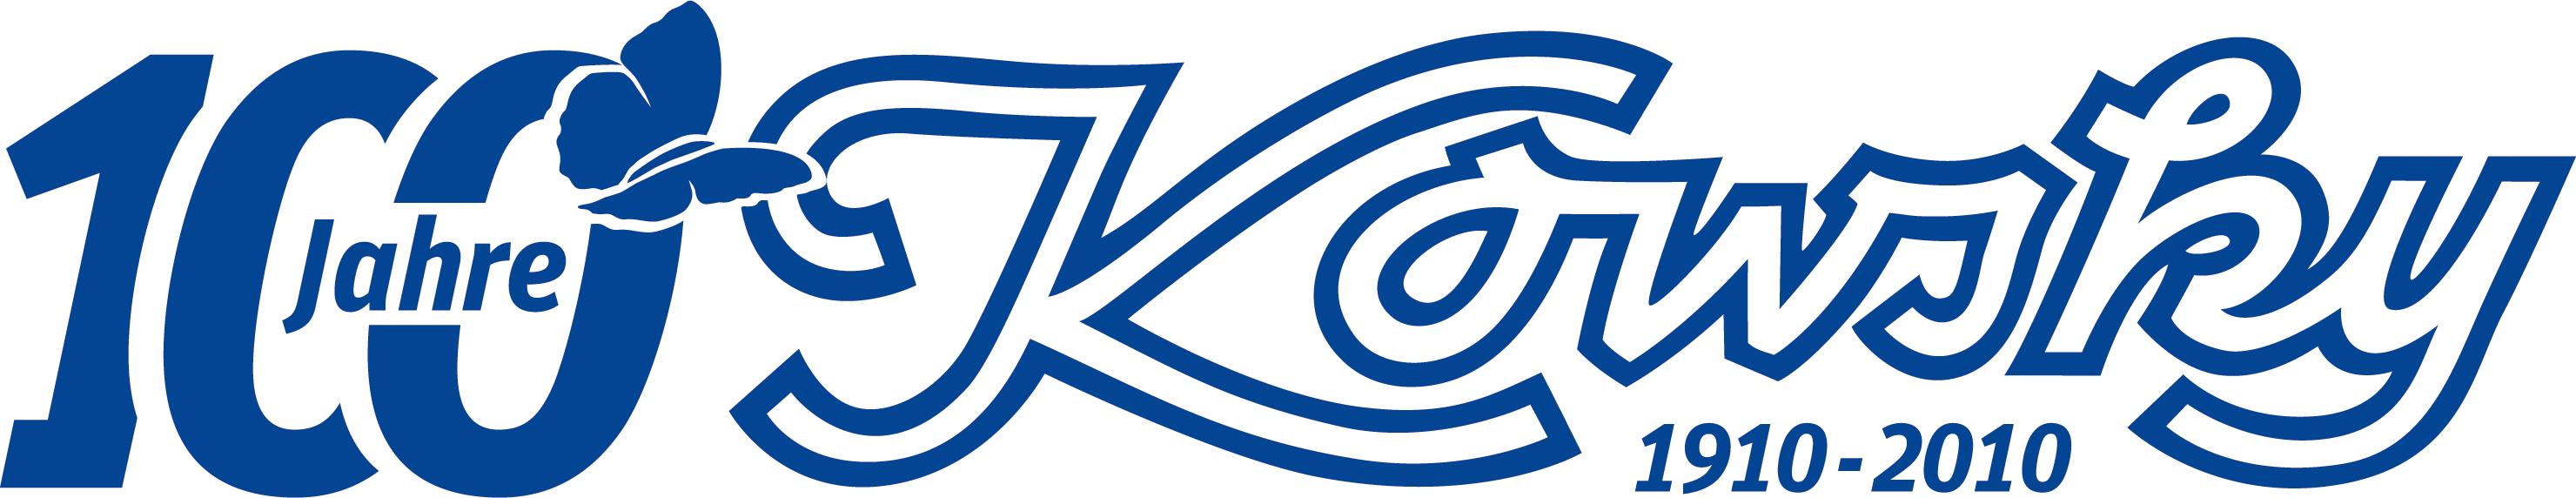 Jubi_logo_blau